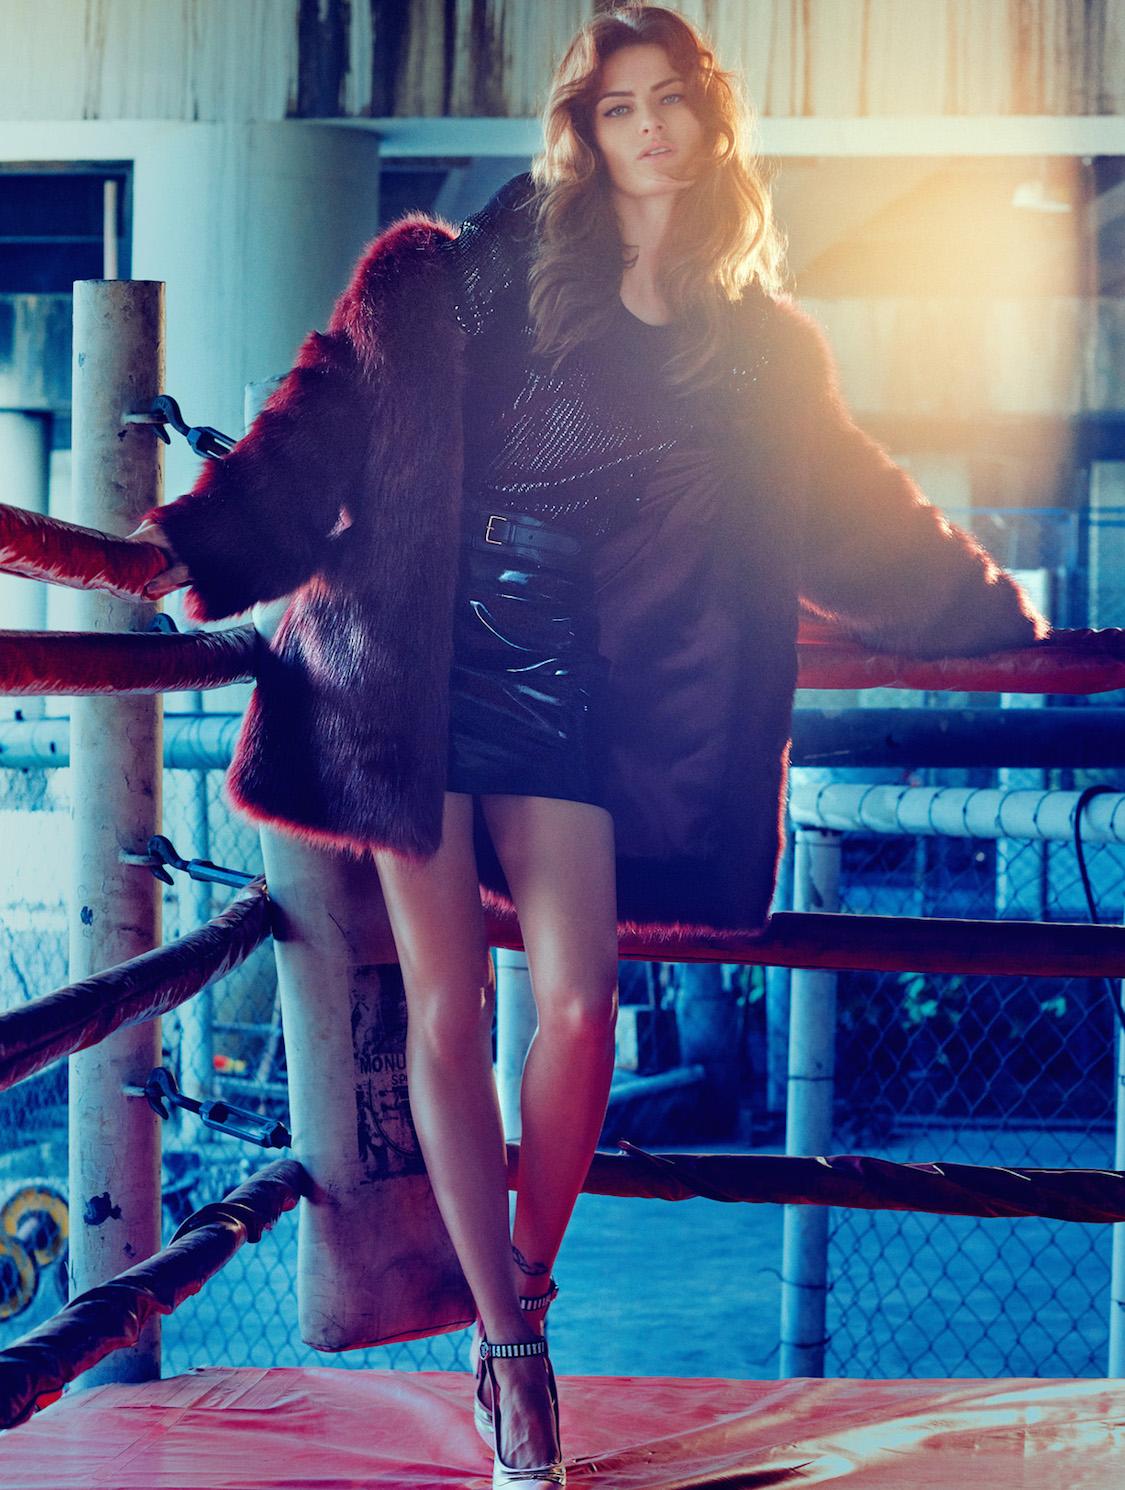 Nicole-Heiniger-fotografa-de-moda-e-beleza-danielle-noce-3